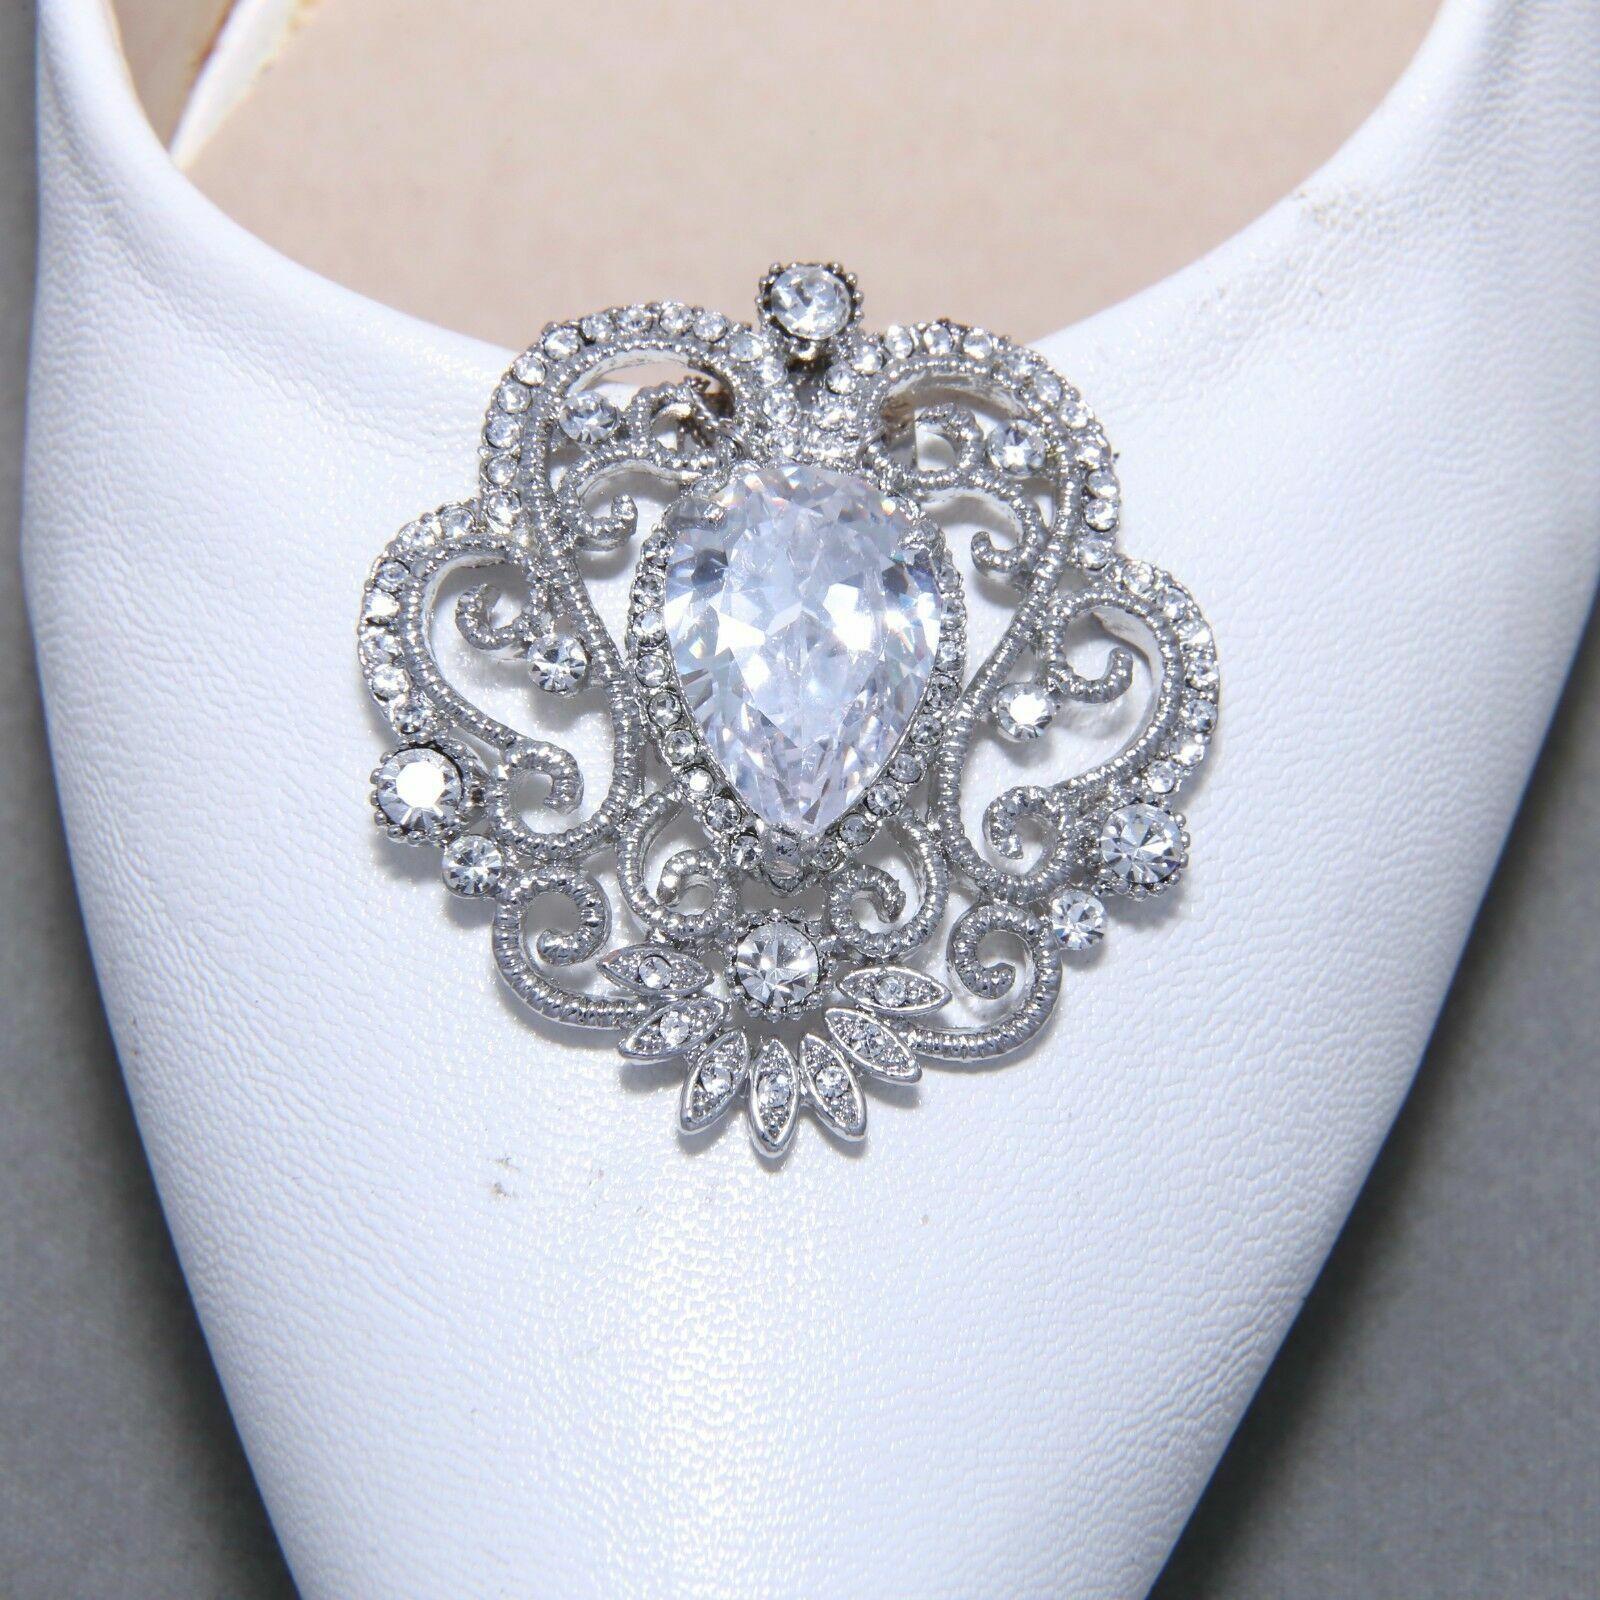 2 Pcs Vintage Style Rhinestone Bridal Wedding Teardrop Crystal Shoe Clips Silver